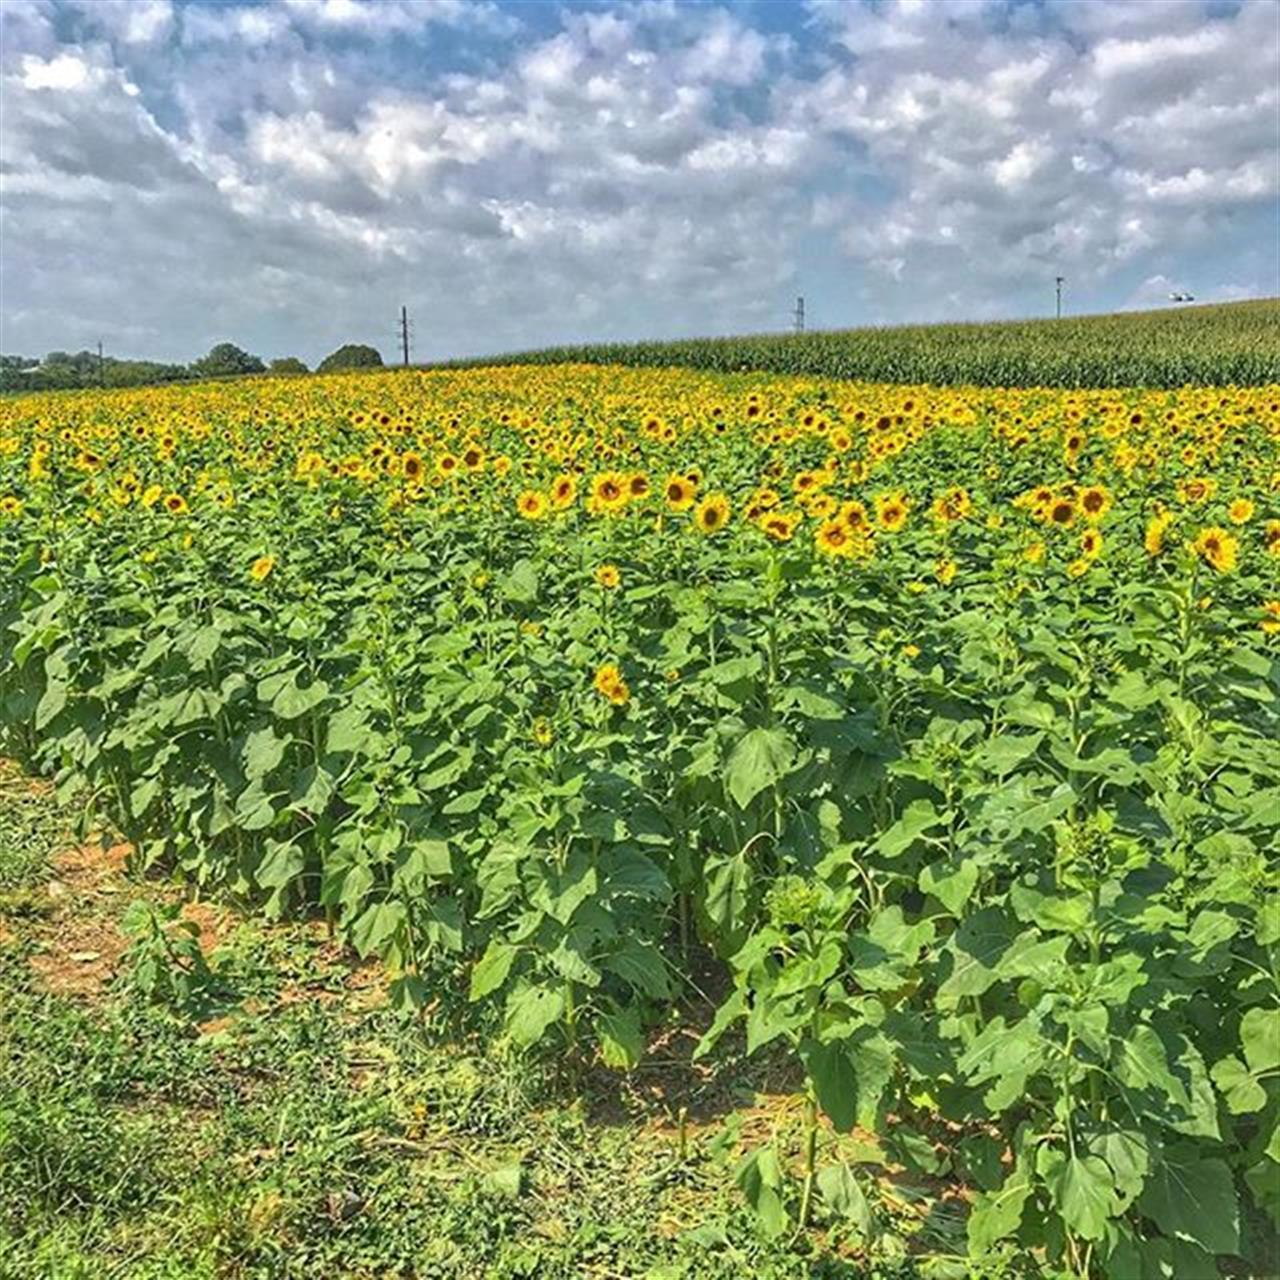 Sunshine and sunflowers! #sunflower #dayton #virginia #leadingrelocal